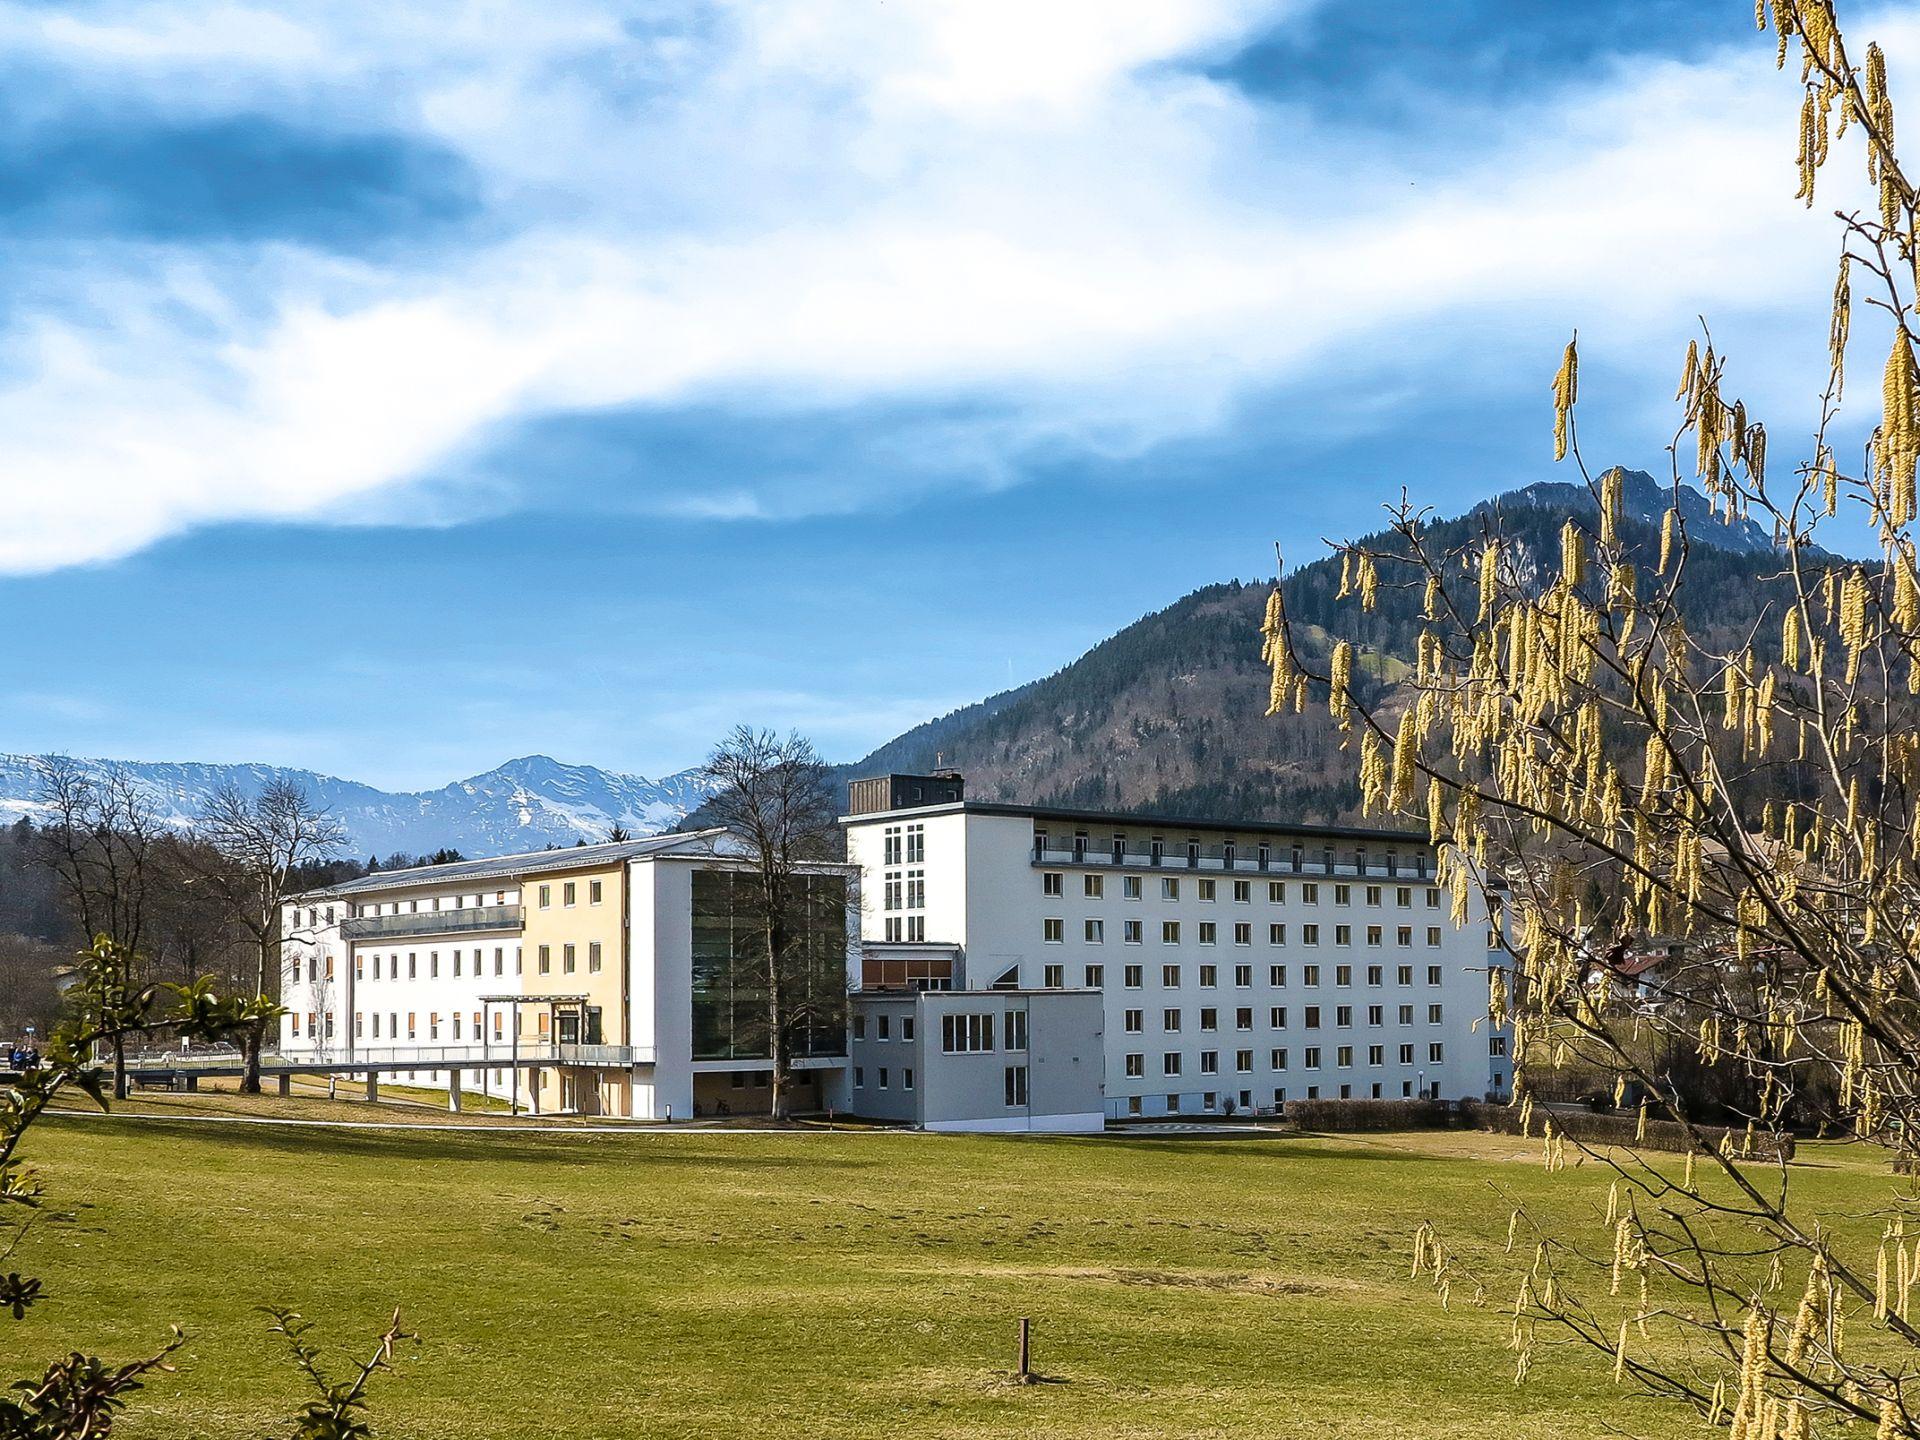 Kreisklinik Berchtesgaden